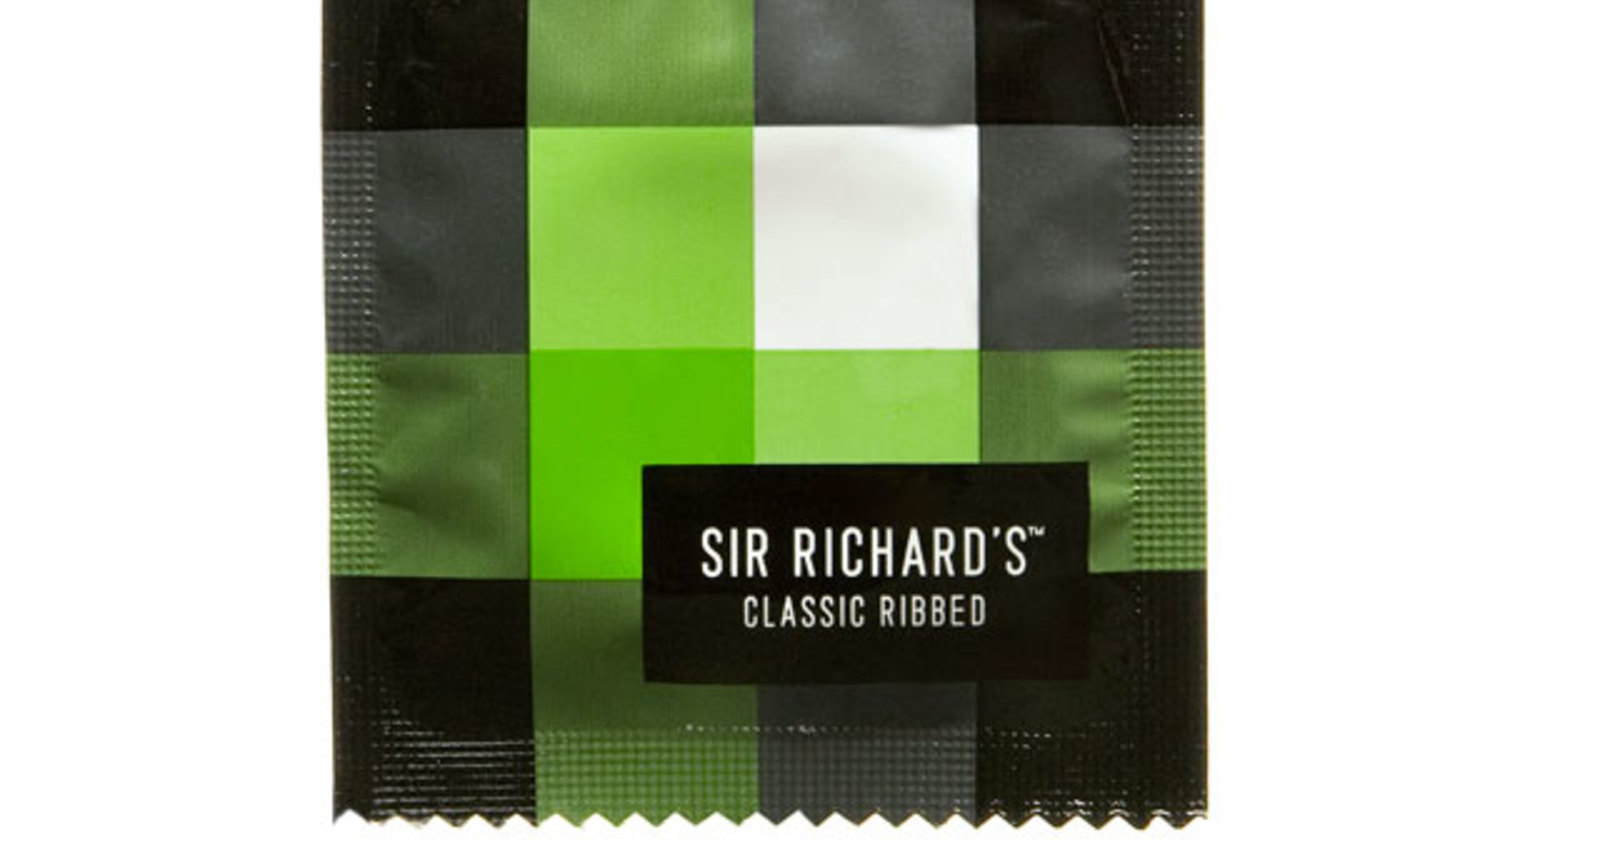 Sir Richard's Package Design